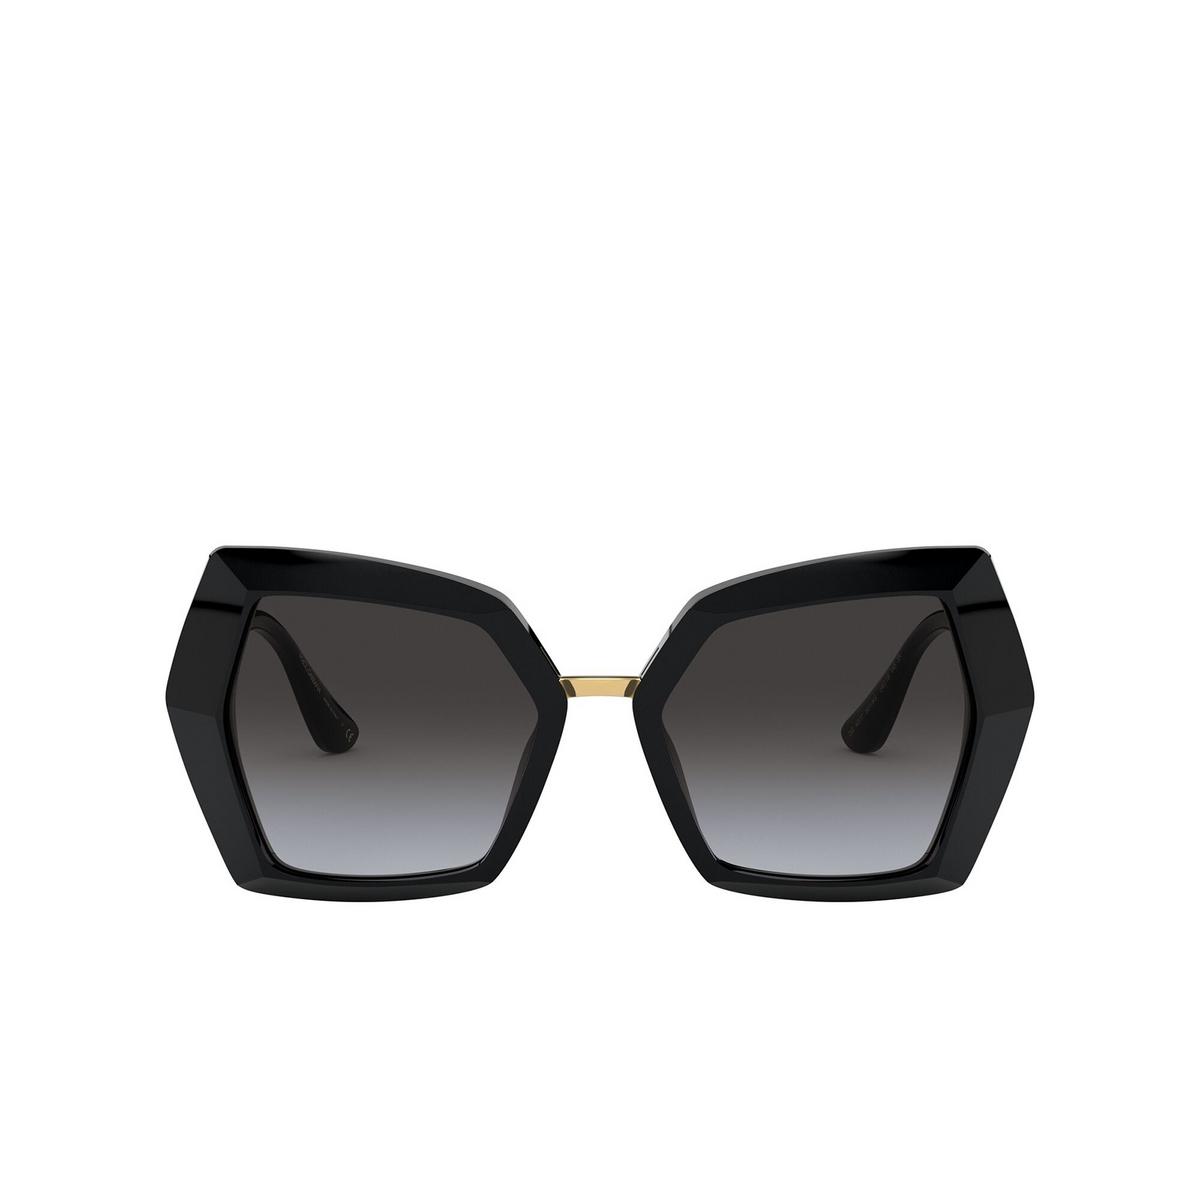 Dolce & Gabbana® Butterfly Sunglasses: DG4377 color Black 501/8G - front view.